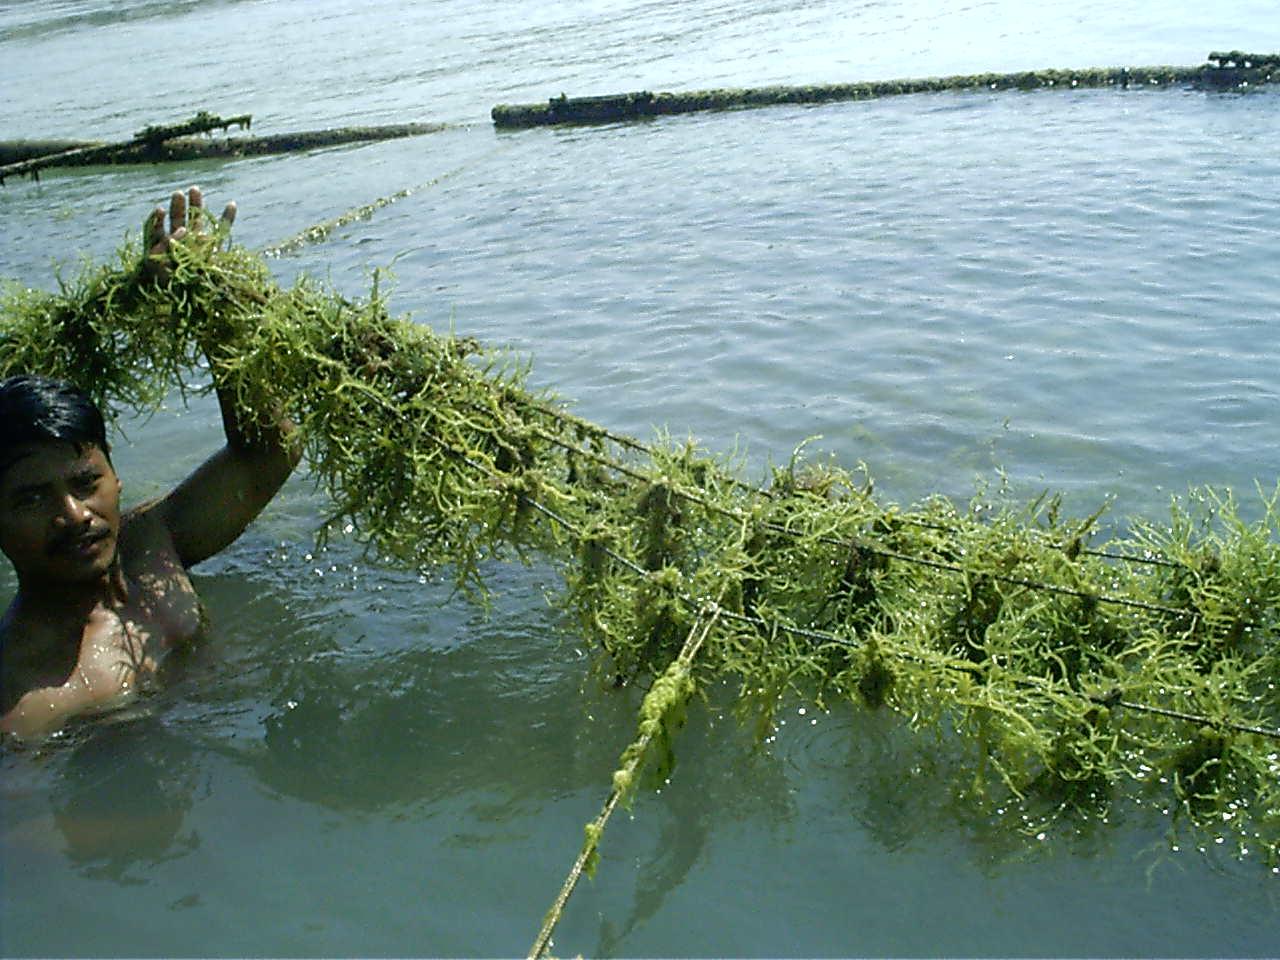 Petunjuk Praktis Mengelola Pasca Panen Rumput Laut Pakan Djpb Direktorat Jenderal Perikanan Budidaya